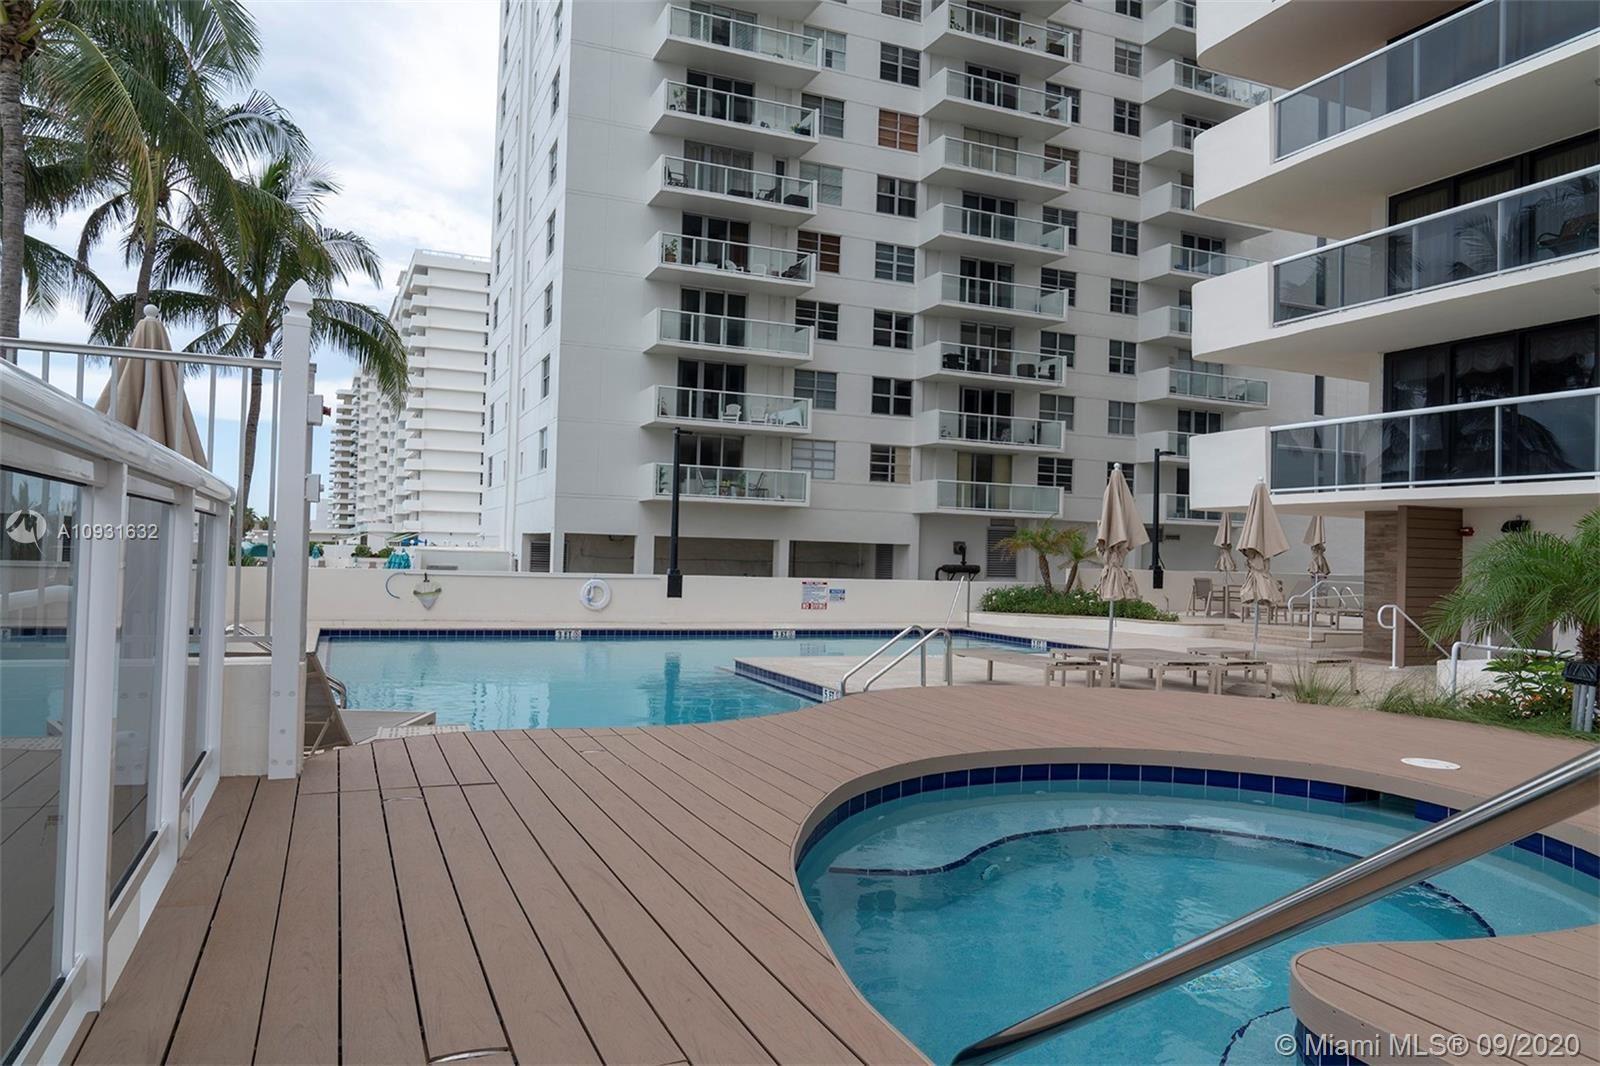 Photo of 5757 Collins Ave #402, Miami Beach, FL 33140 (MLS # A10931632)